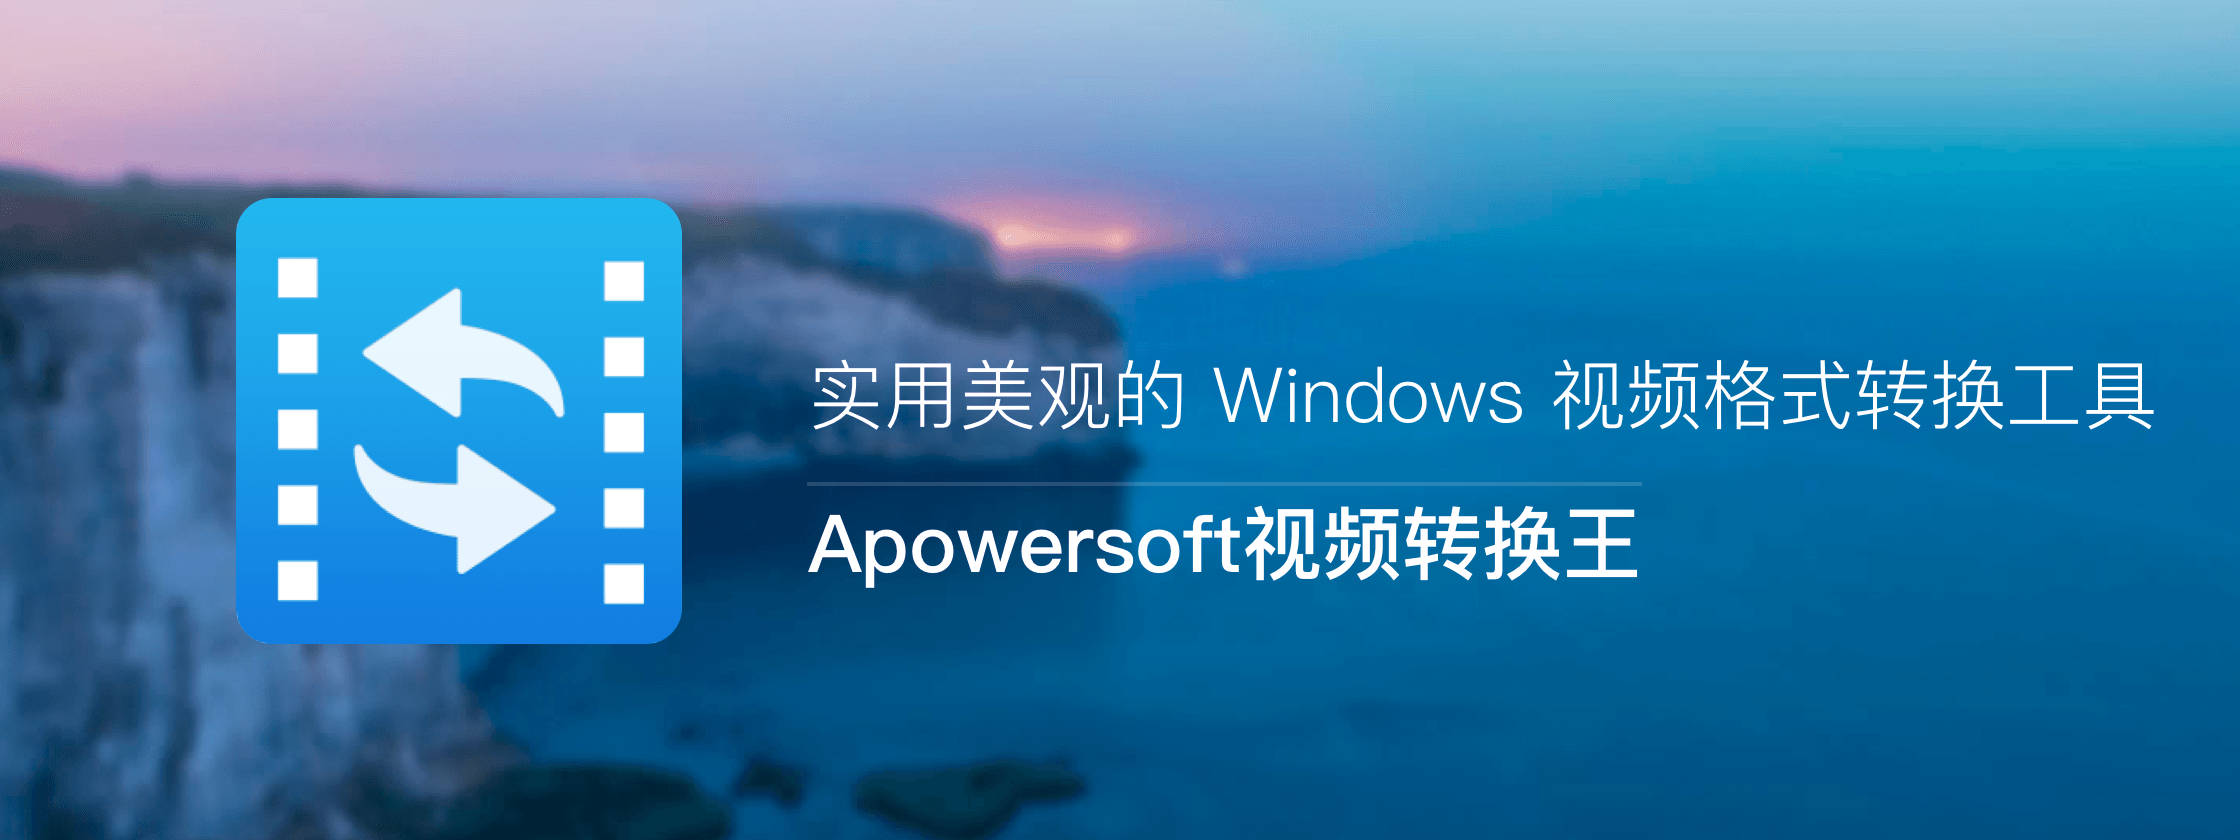 Apowersoft 视频转换王 – 实用美观的 Windows 视频格式转换工具